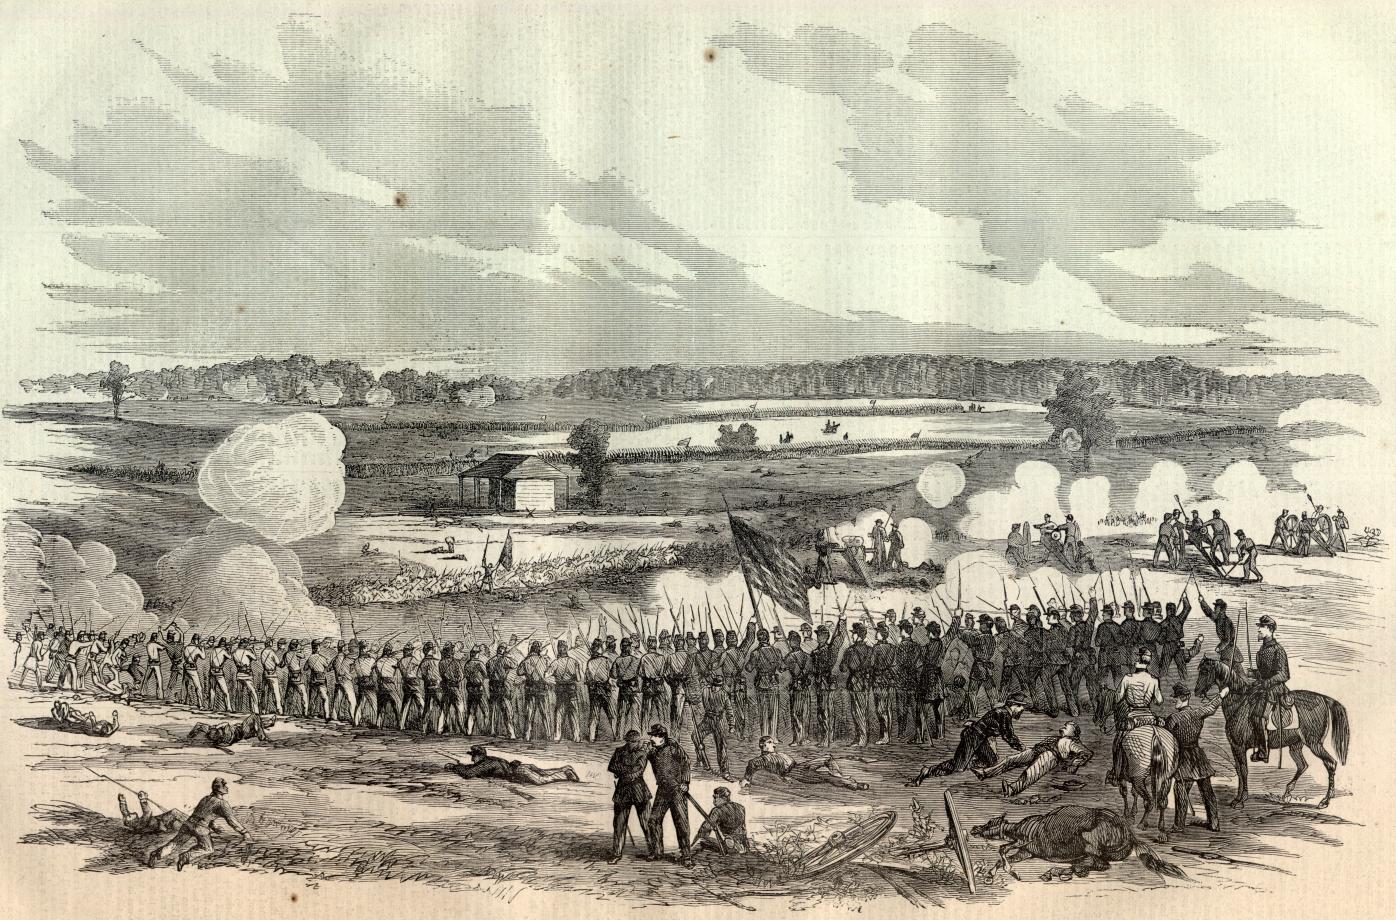 Harper's Weekly Depiction of Perryville Battle, Nov 1, 1862